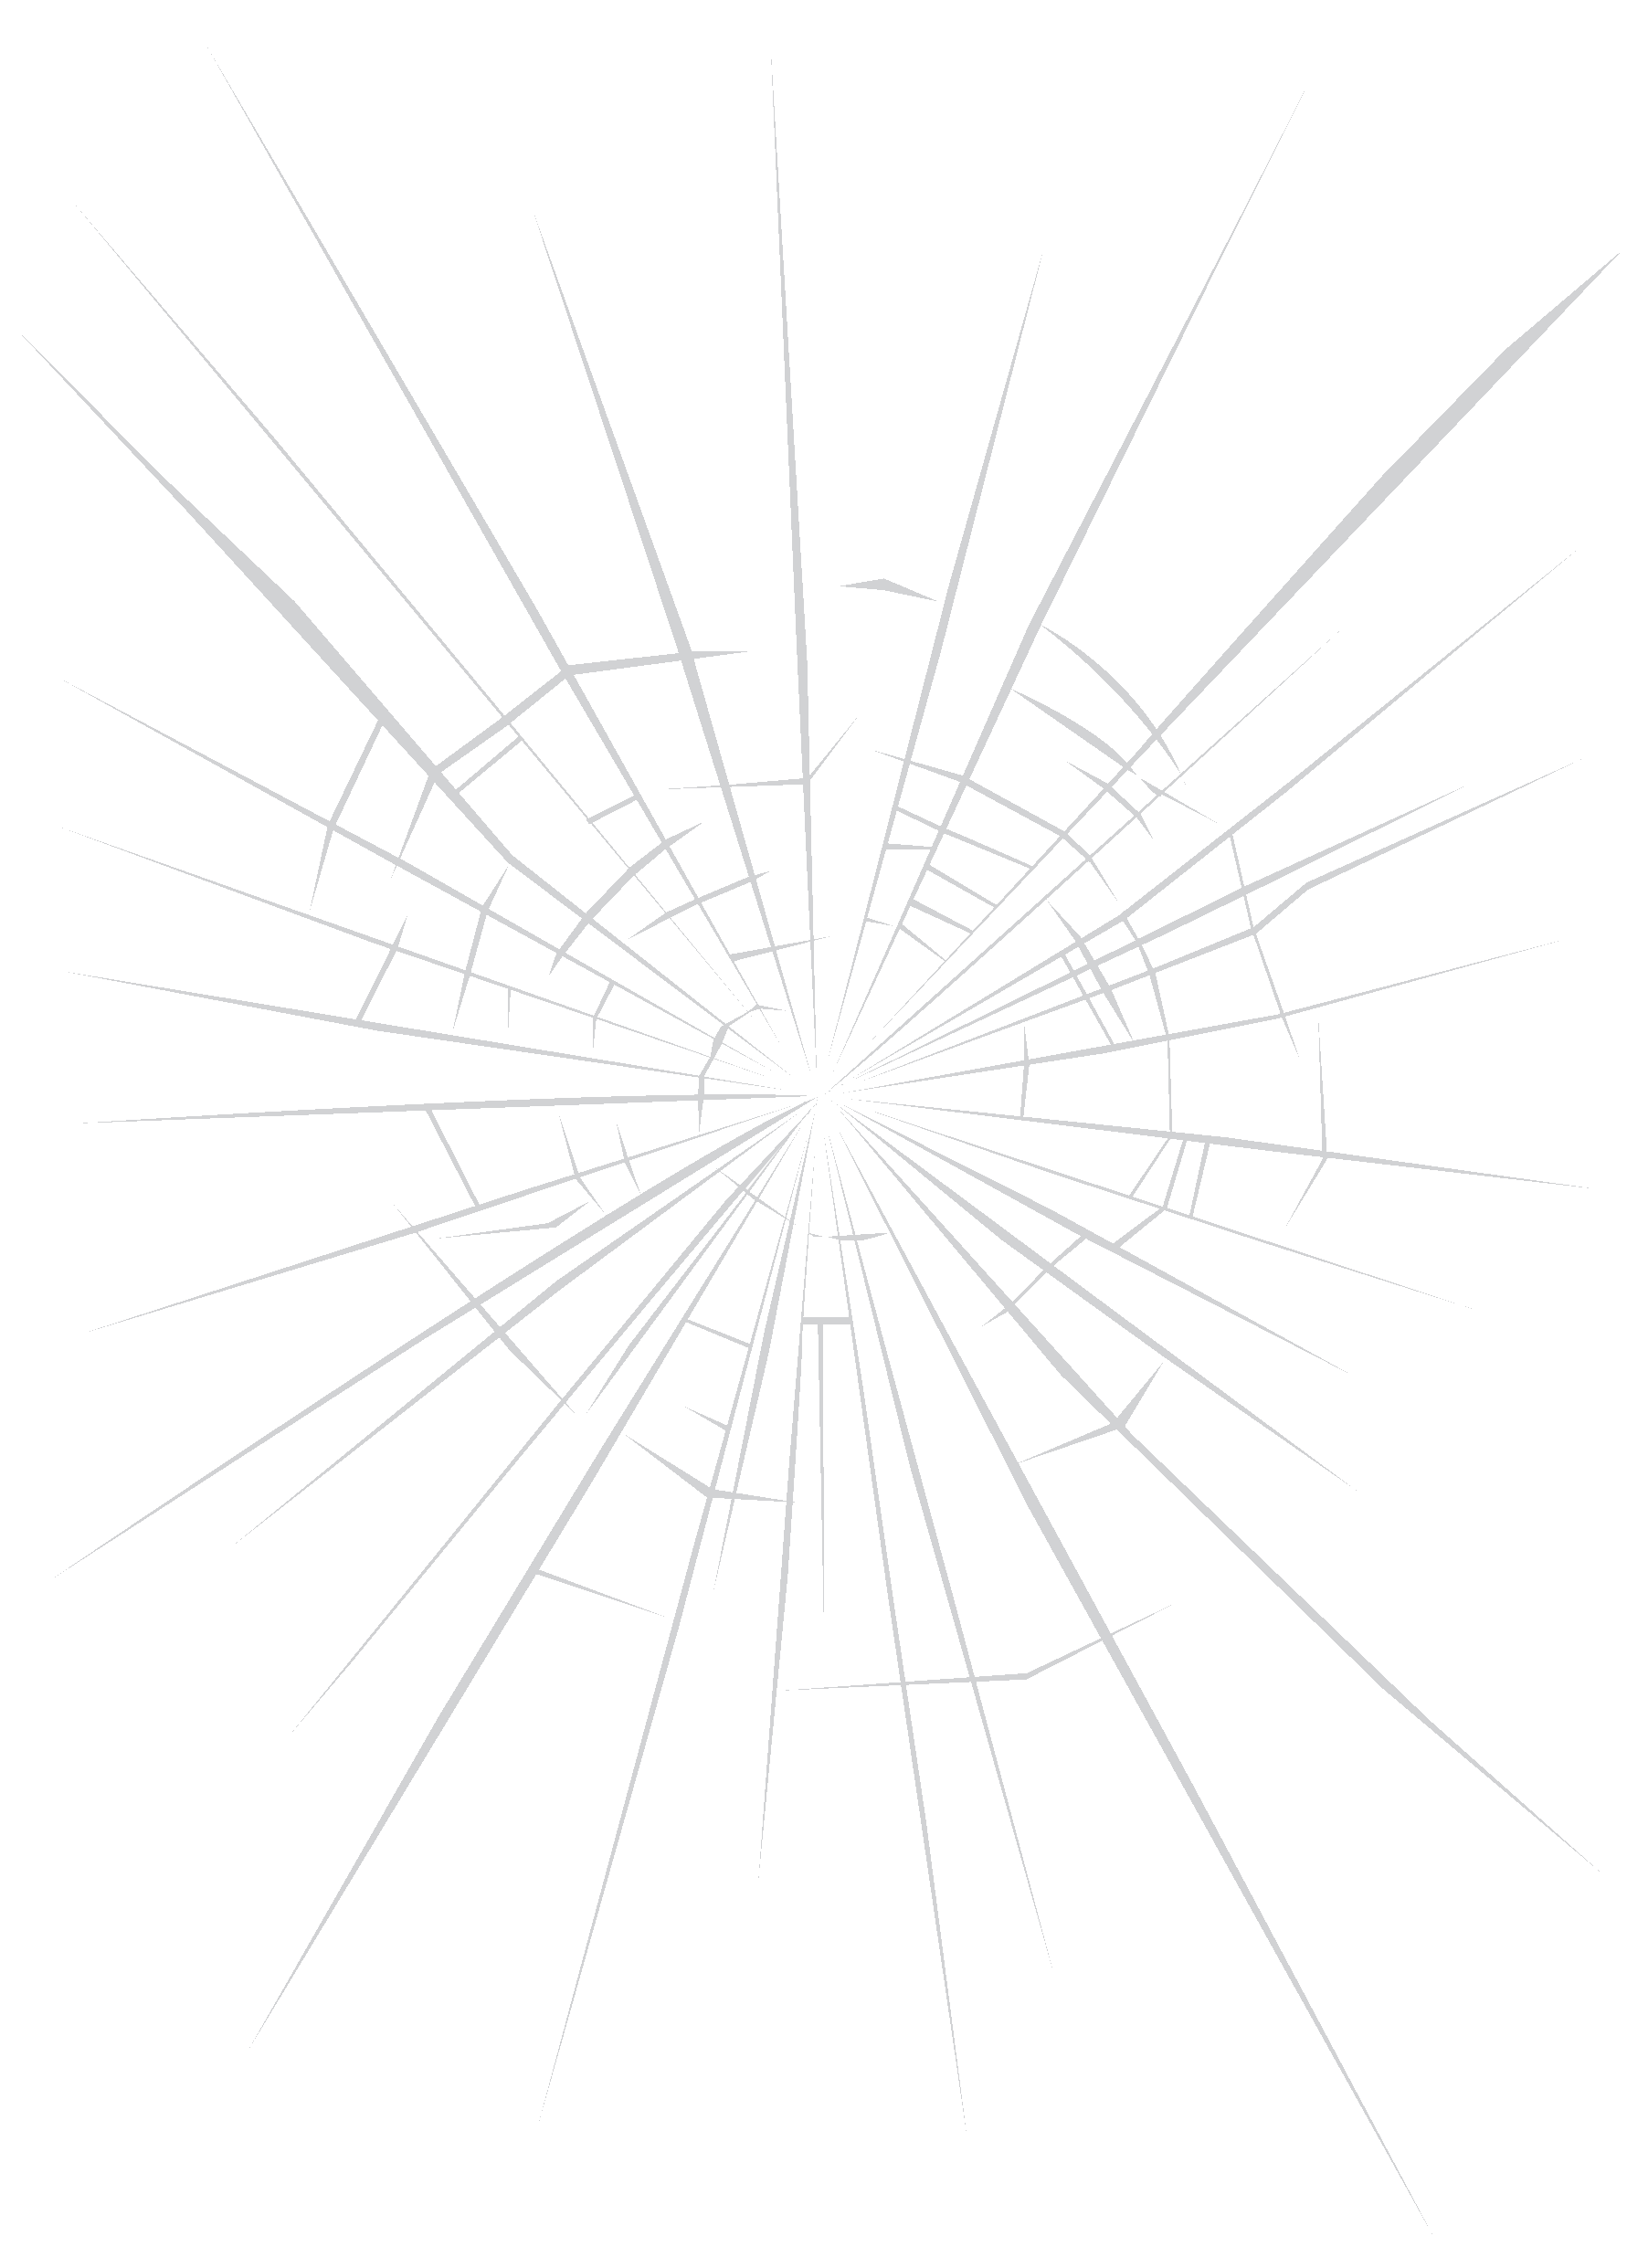 Broken glass transparent png images stickpng broken glass drawing voltagebd Gallery